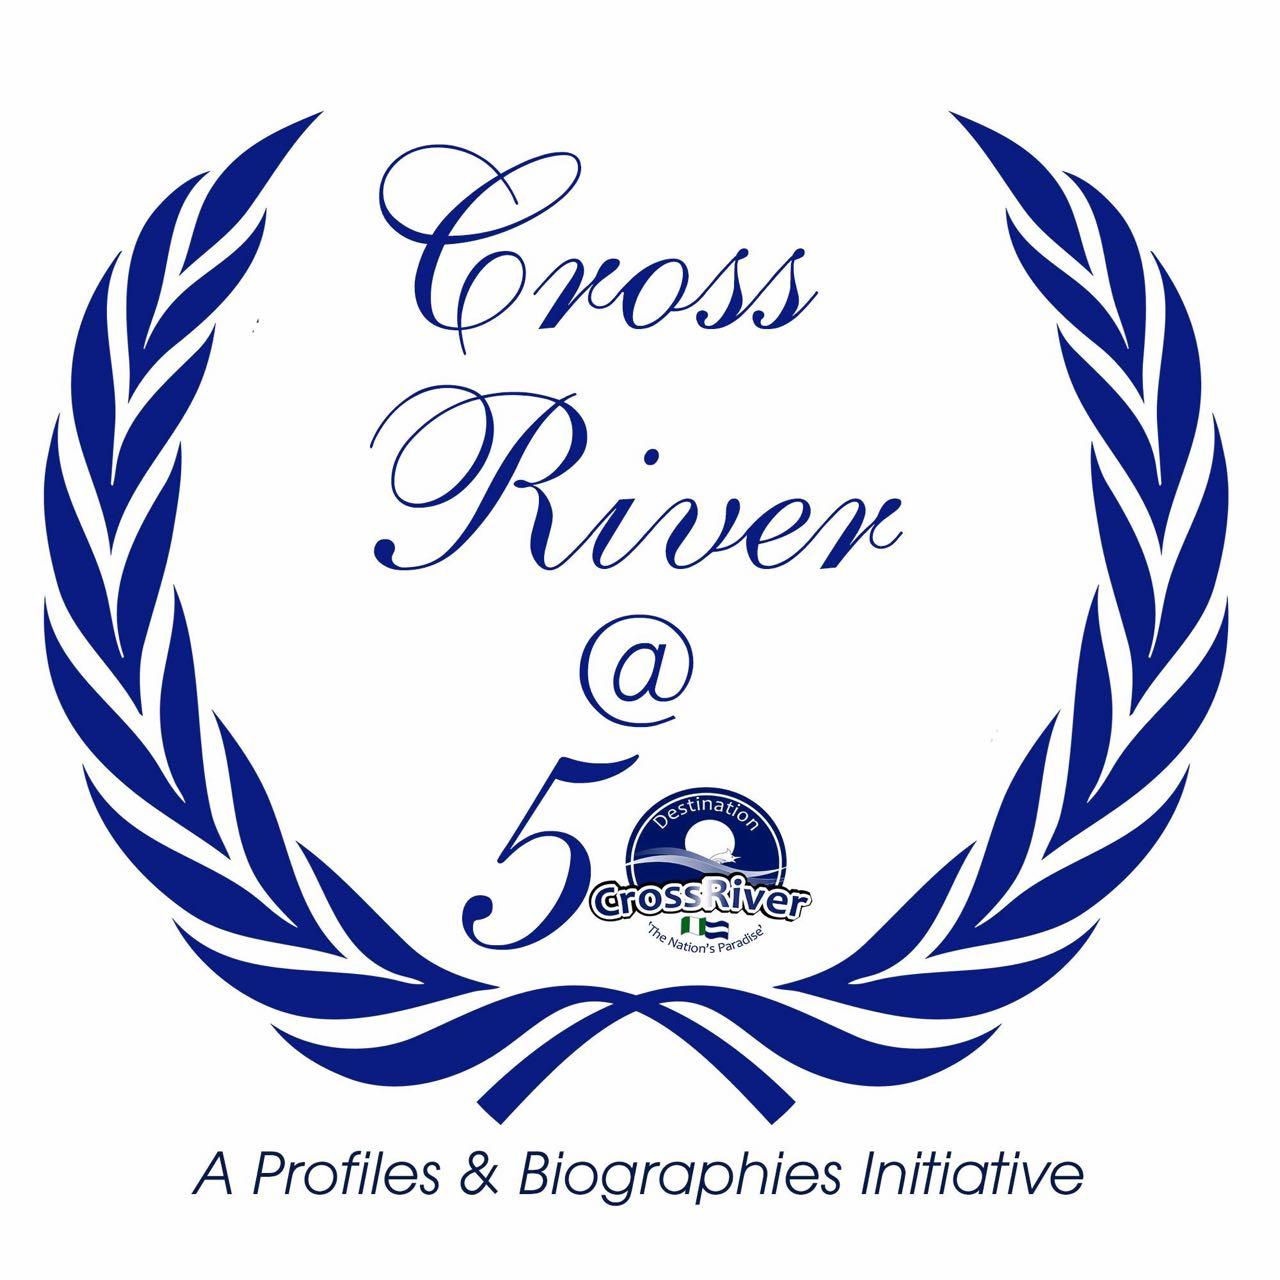 CELEBRATING CROSS RIVER AT 50